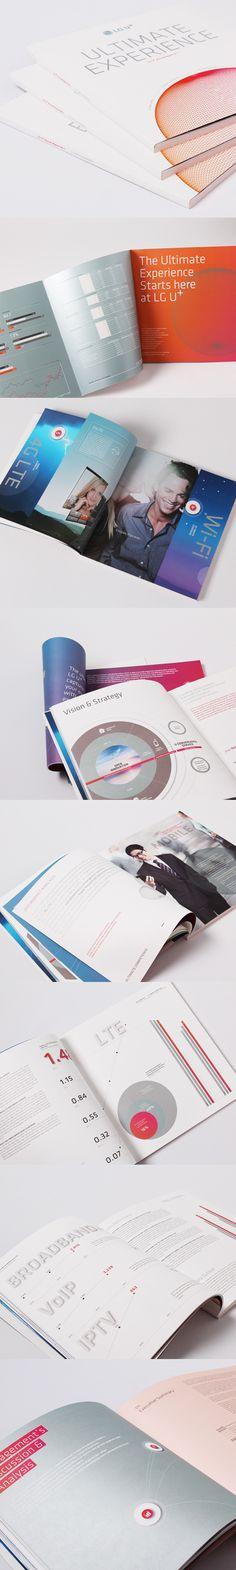 LG U+ annual report 2011 by jungah lee, via Behance Brosure Design, Cover Design, Layout Design, Brochure Layout, Corporate Brochure, Report Design, Catalog Design, Visual Communication, Editorial Design